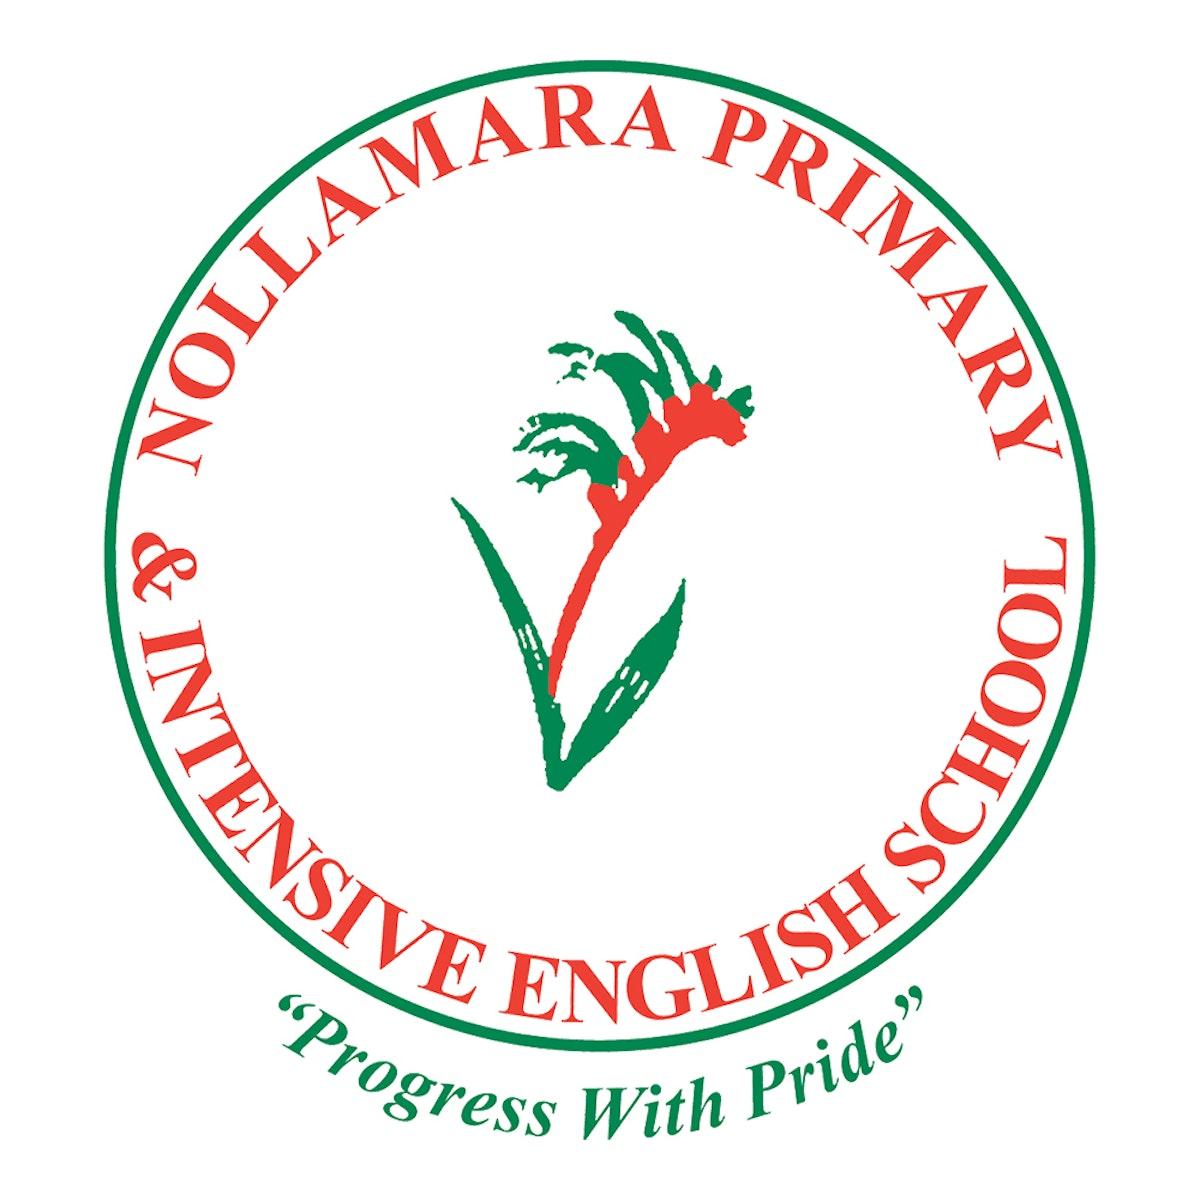 Nollamara PS logo 2011